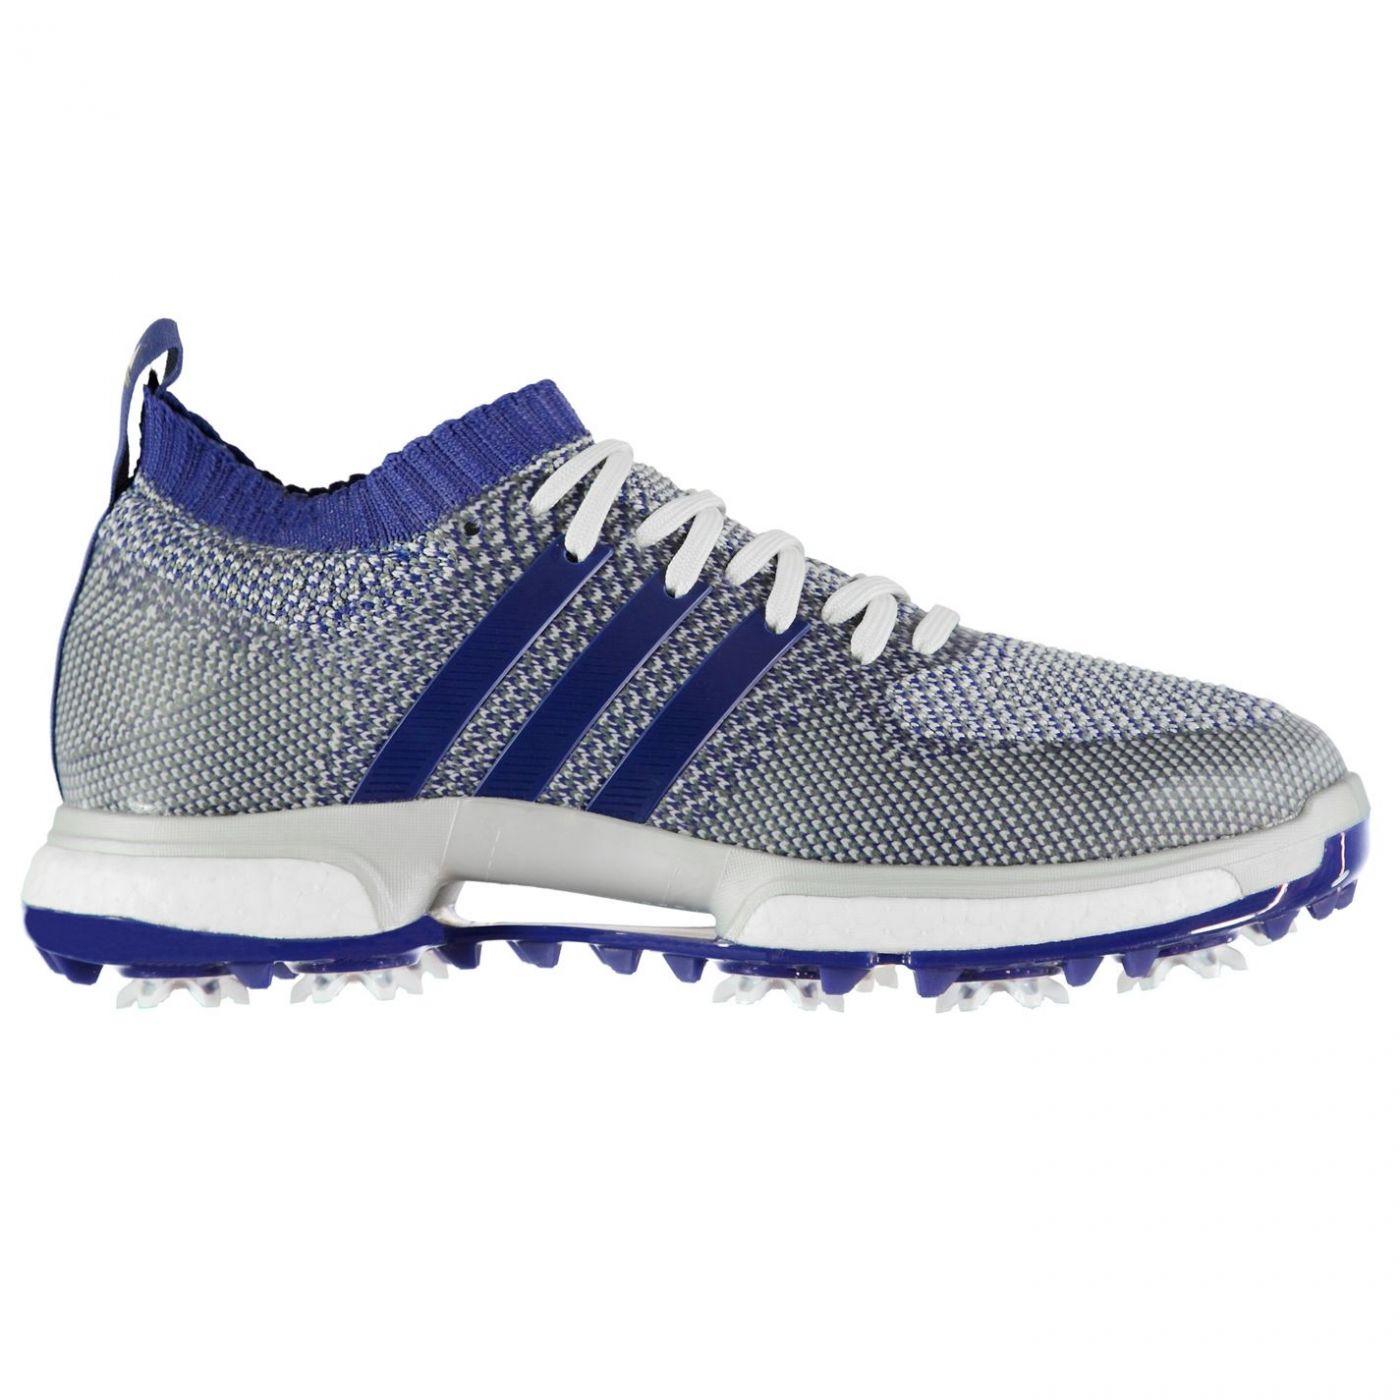 Adidas Tour 360 Knit Mens Golf Shoes